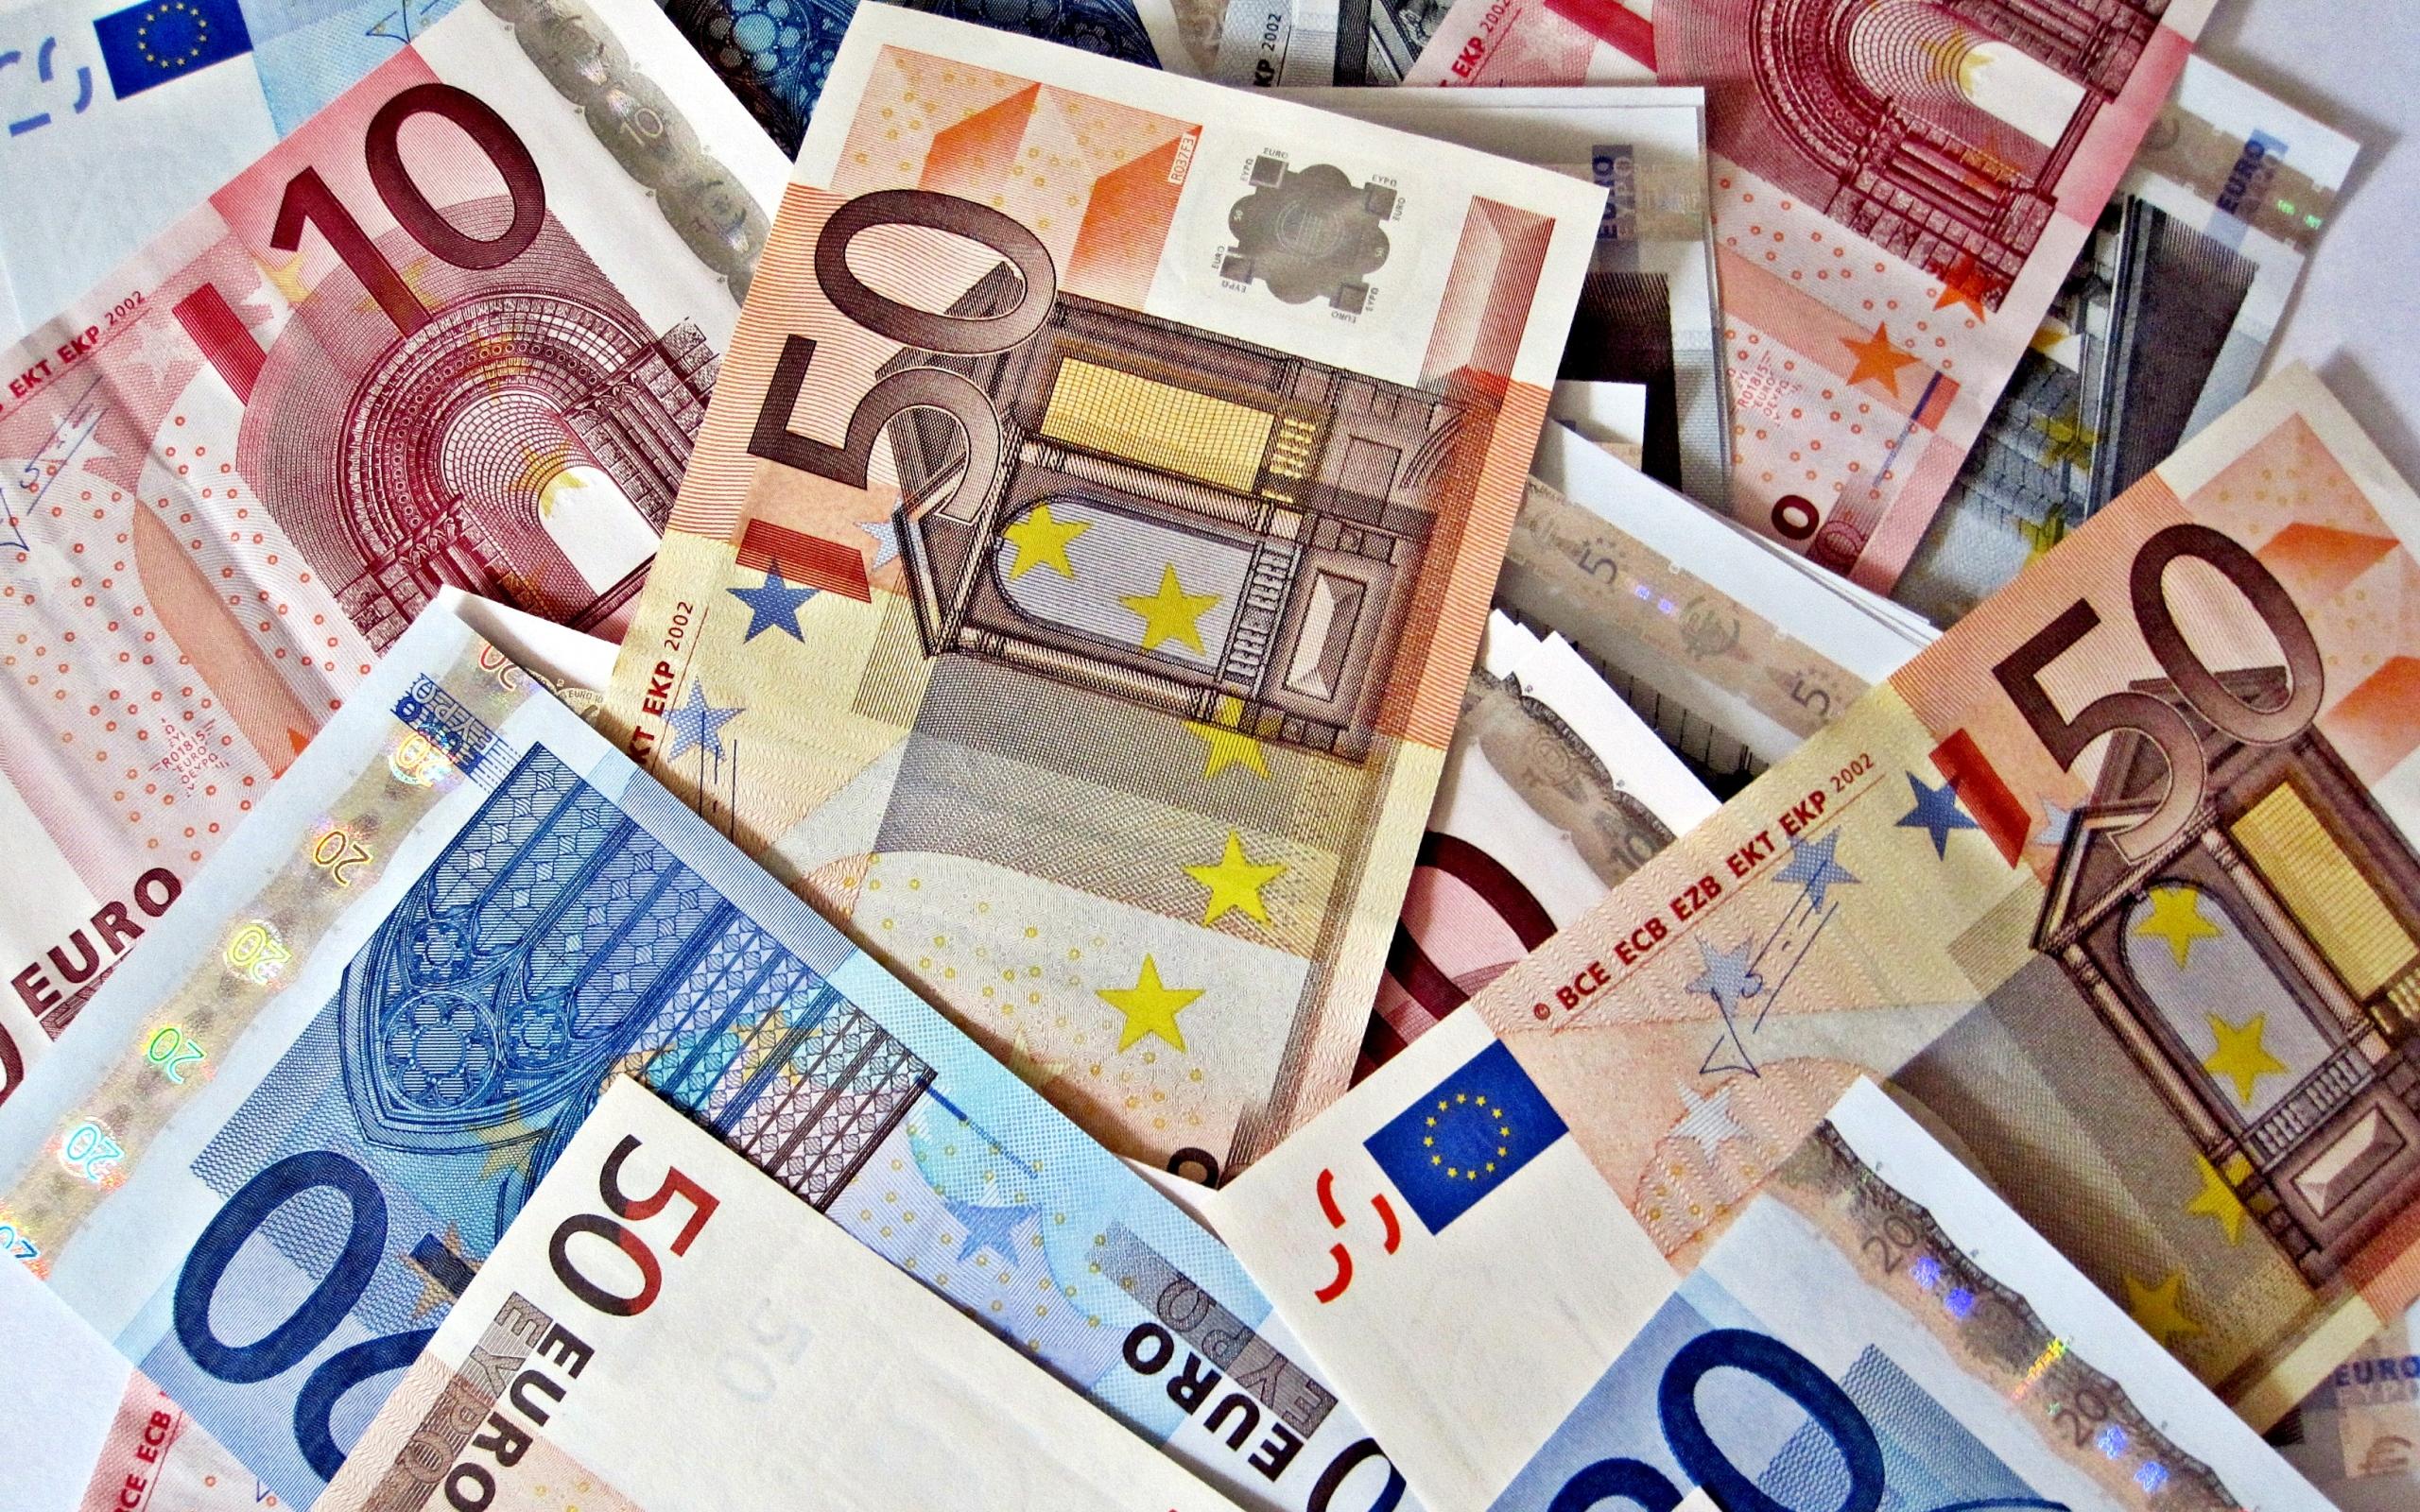 кредитьевропа банк